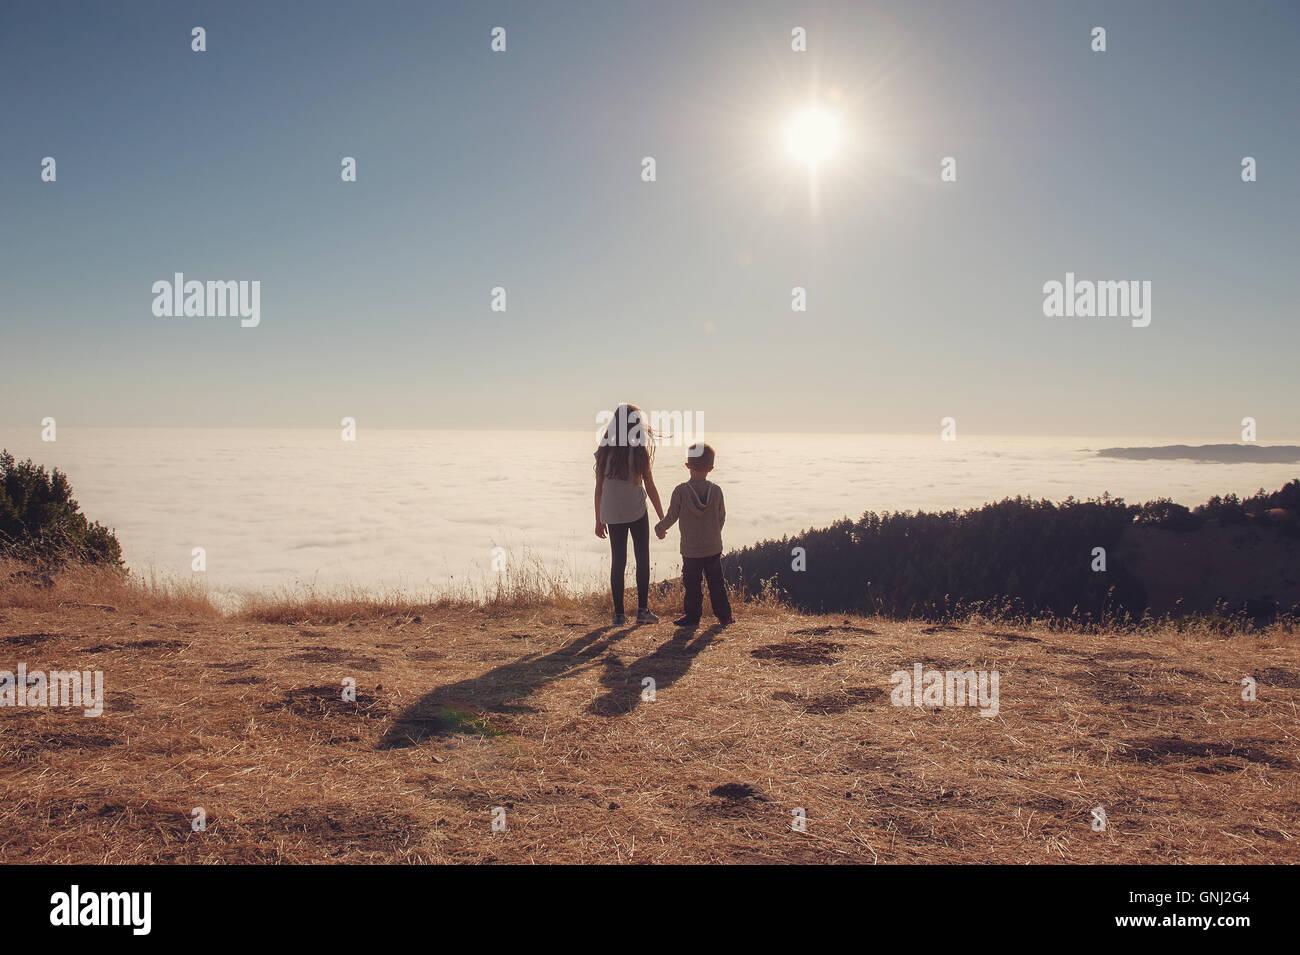 Brother and sister holding hands, Mount Tamalpais, California, America, USA - Stock Image